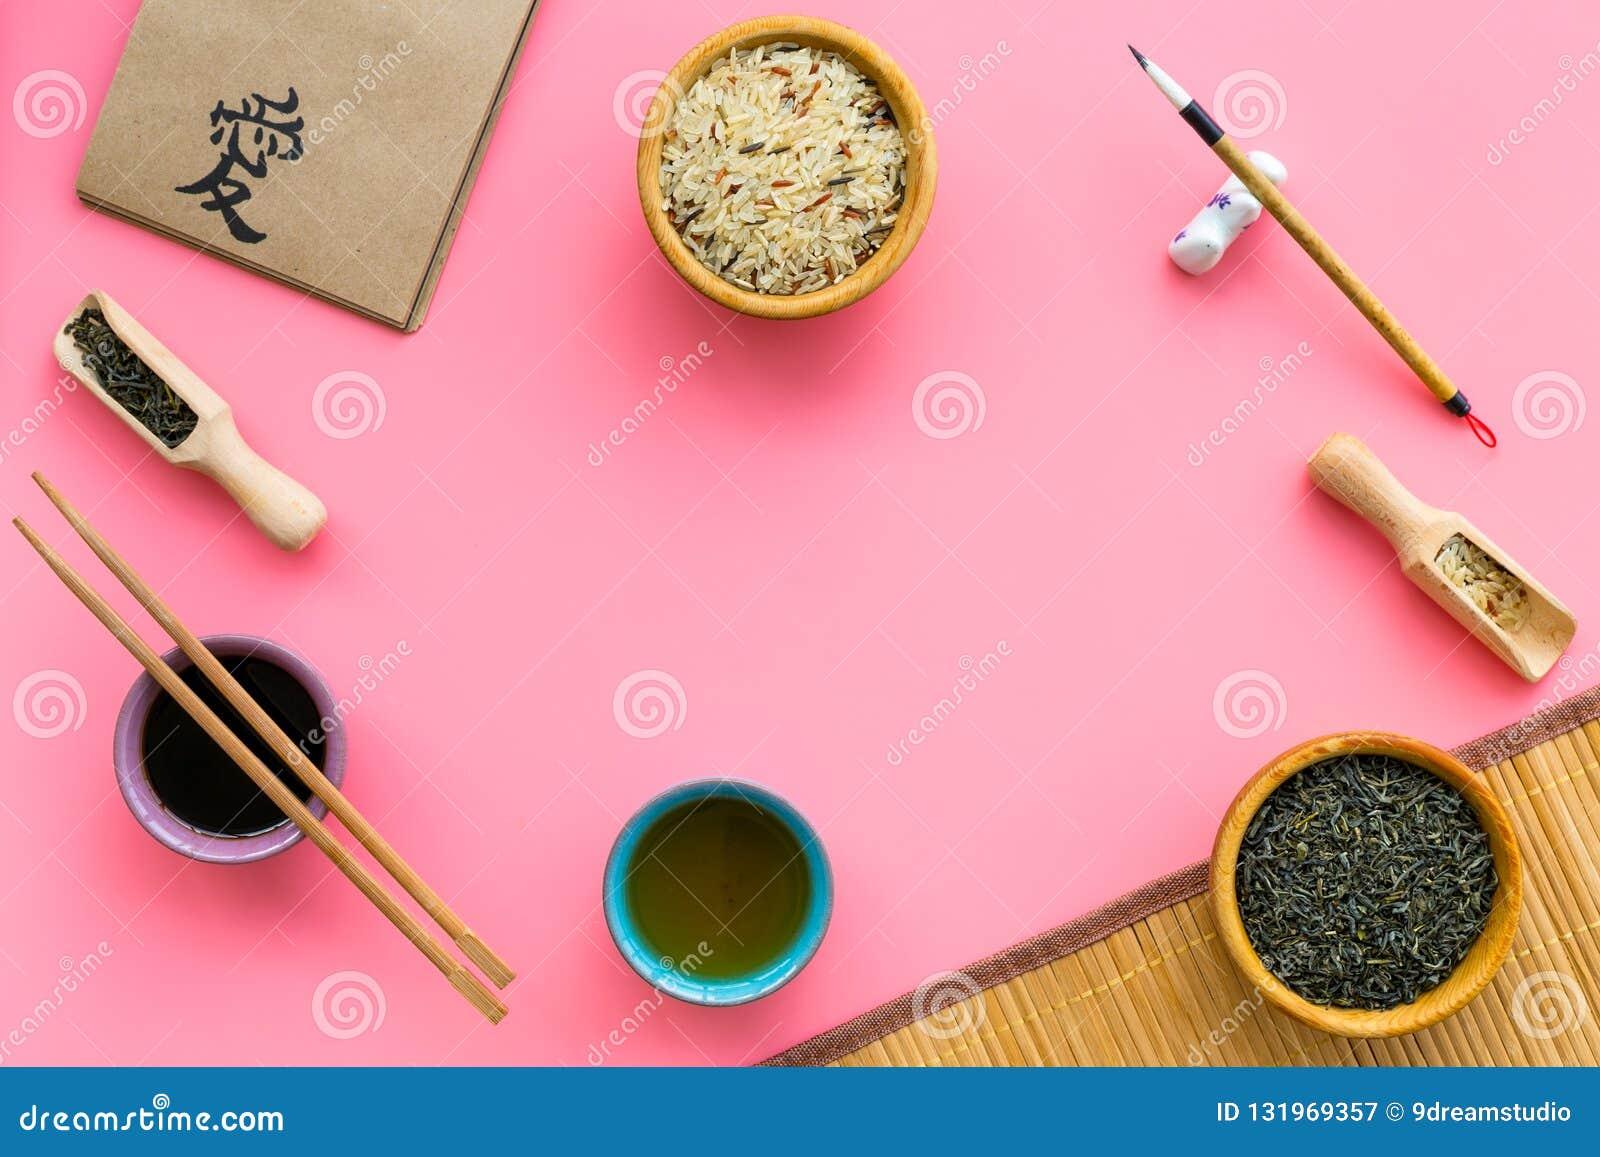 Chinese traditional symbols concept. Tea, rice, hieroglyph symbol, bambootabe mat, chopsticks, soy sause on pink